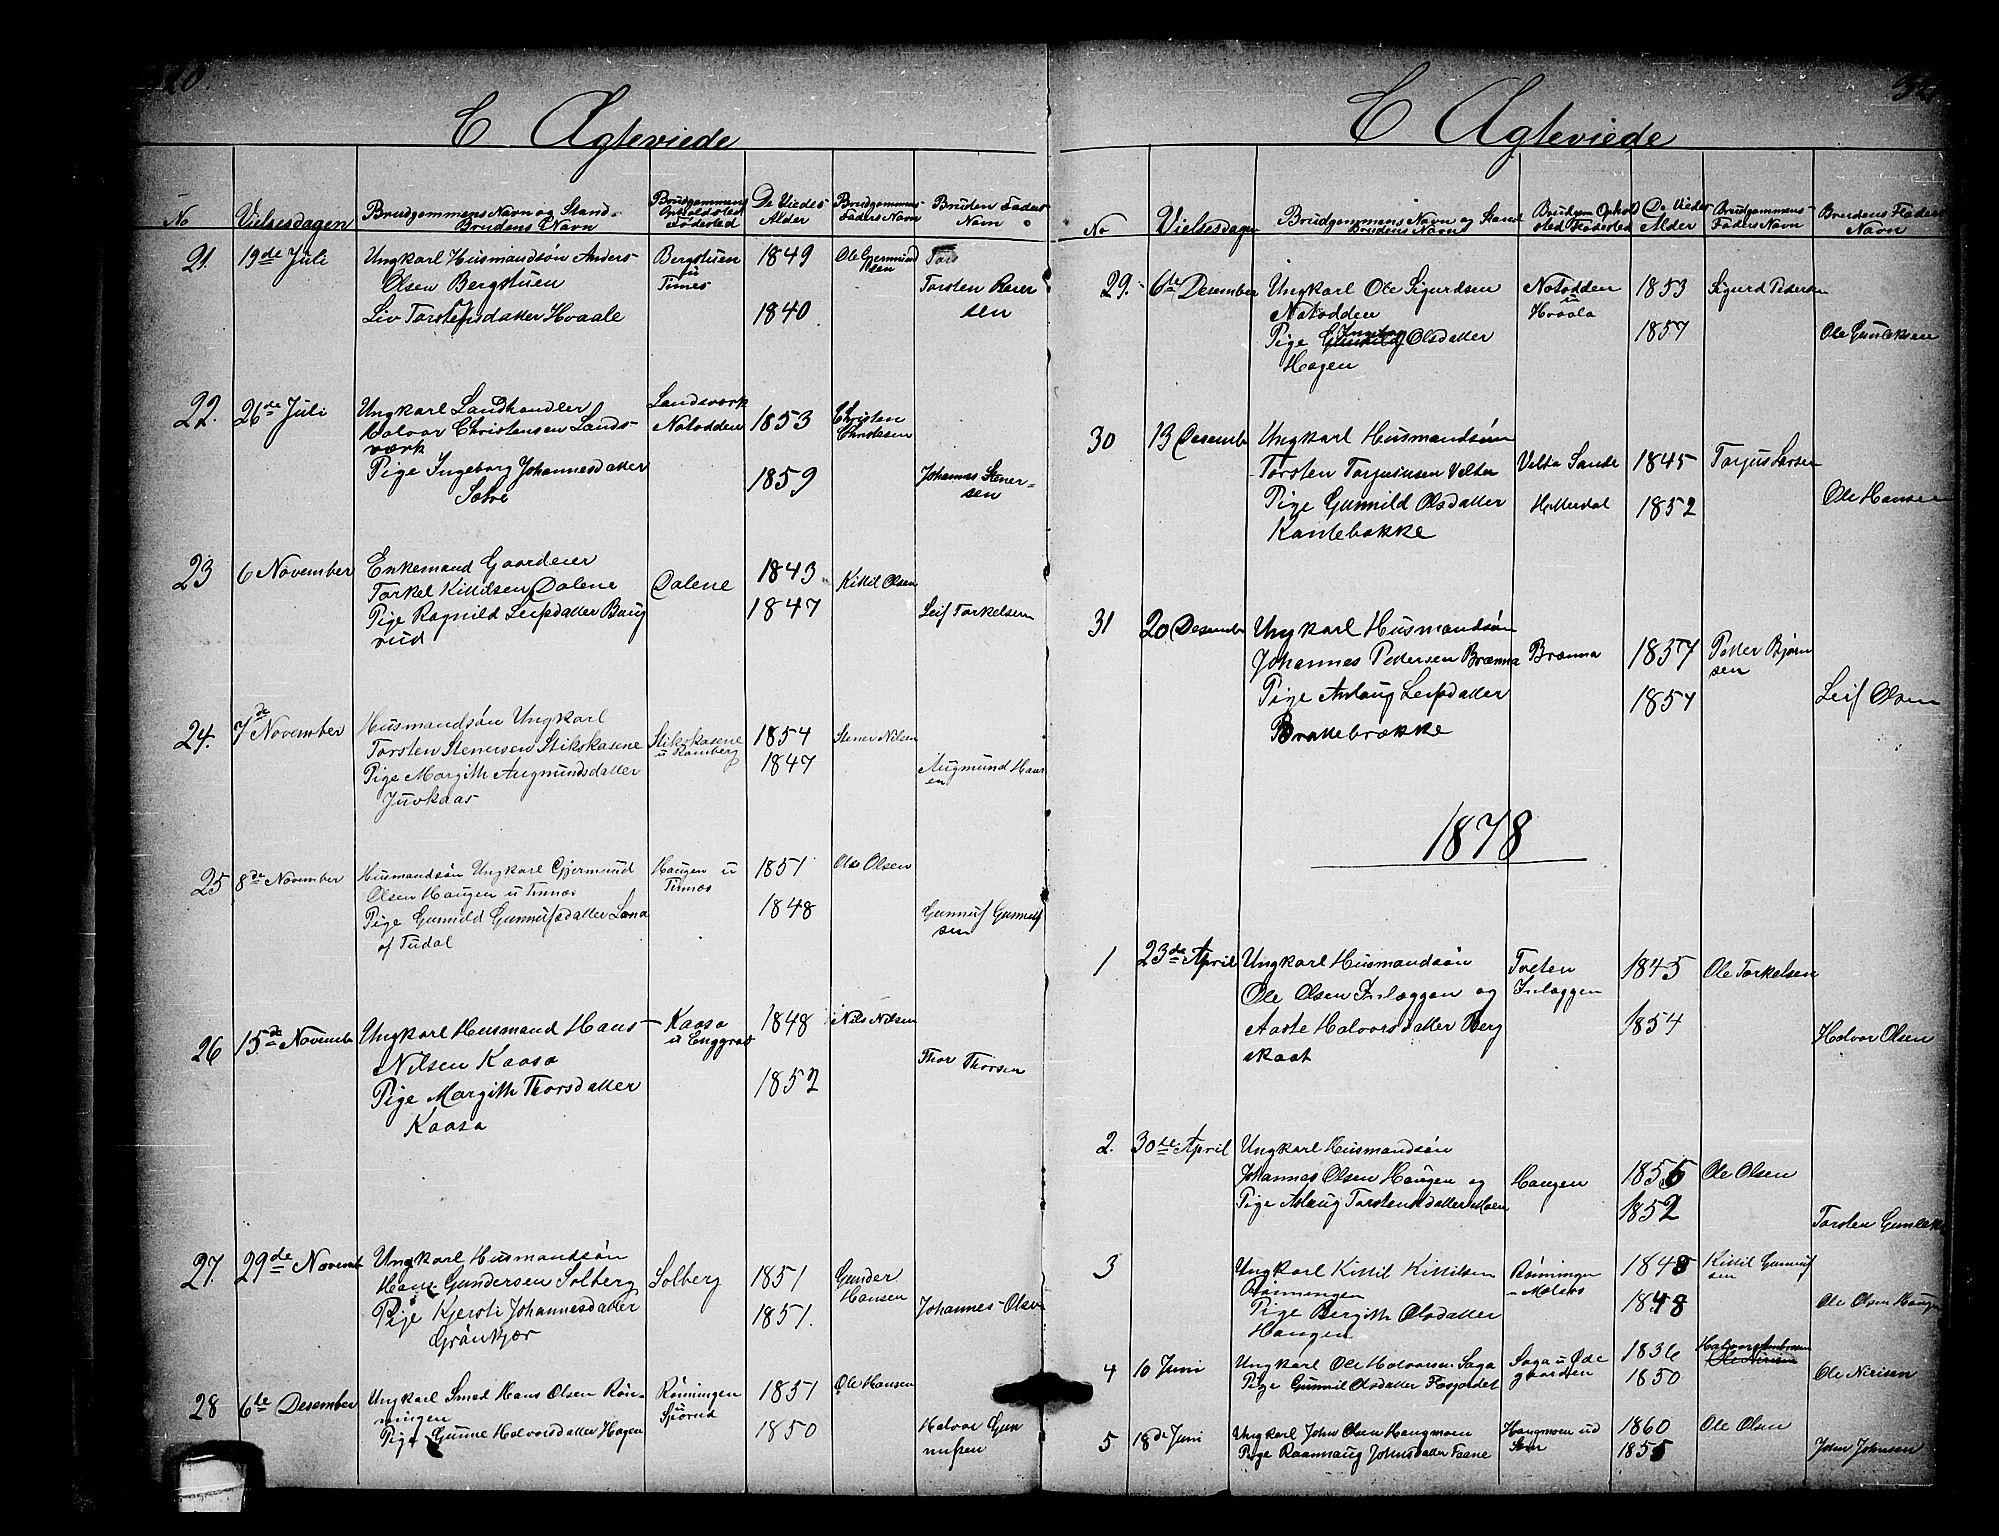 SAKO, Heddal kirkebøker, G/Ga/L0001: Klokkerbok nr. I 1, 1866-1878, s. 320-321